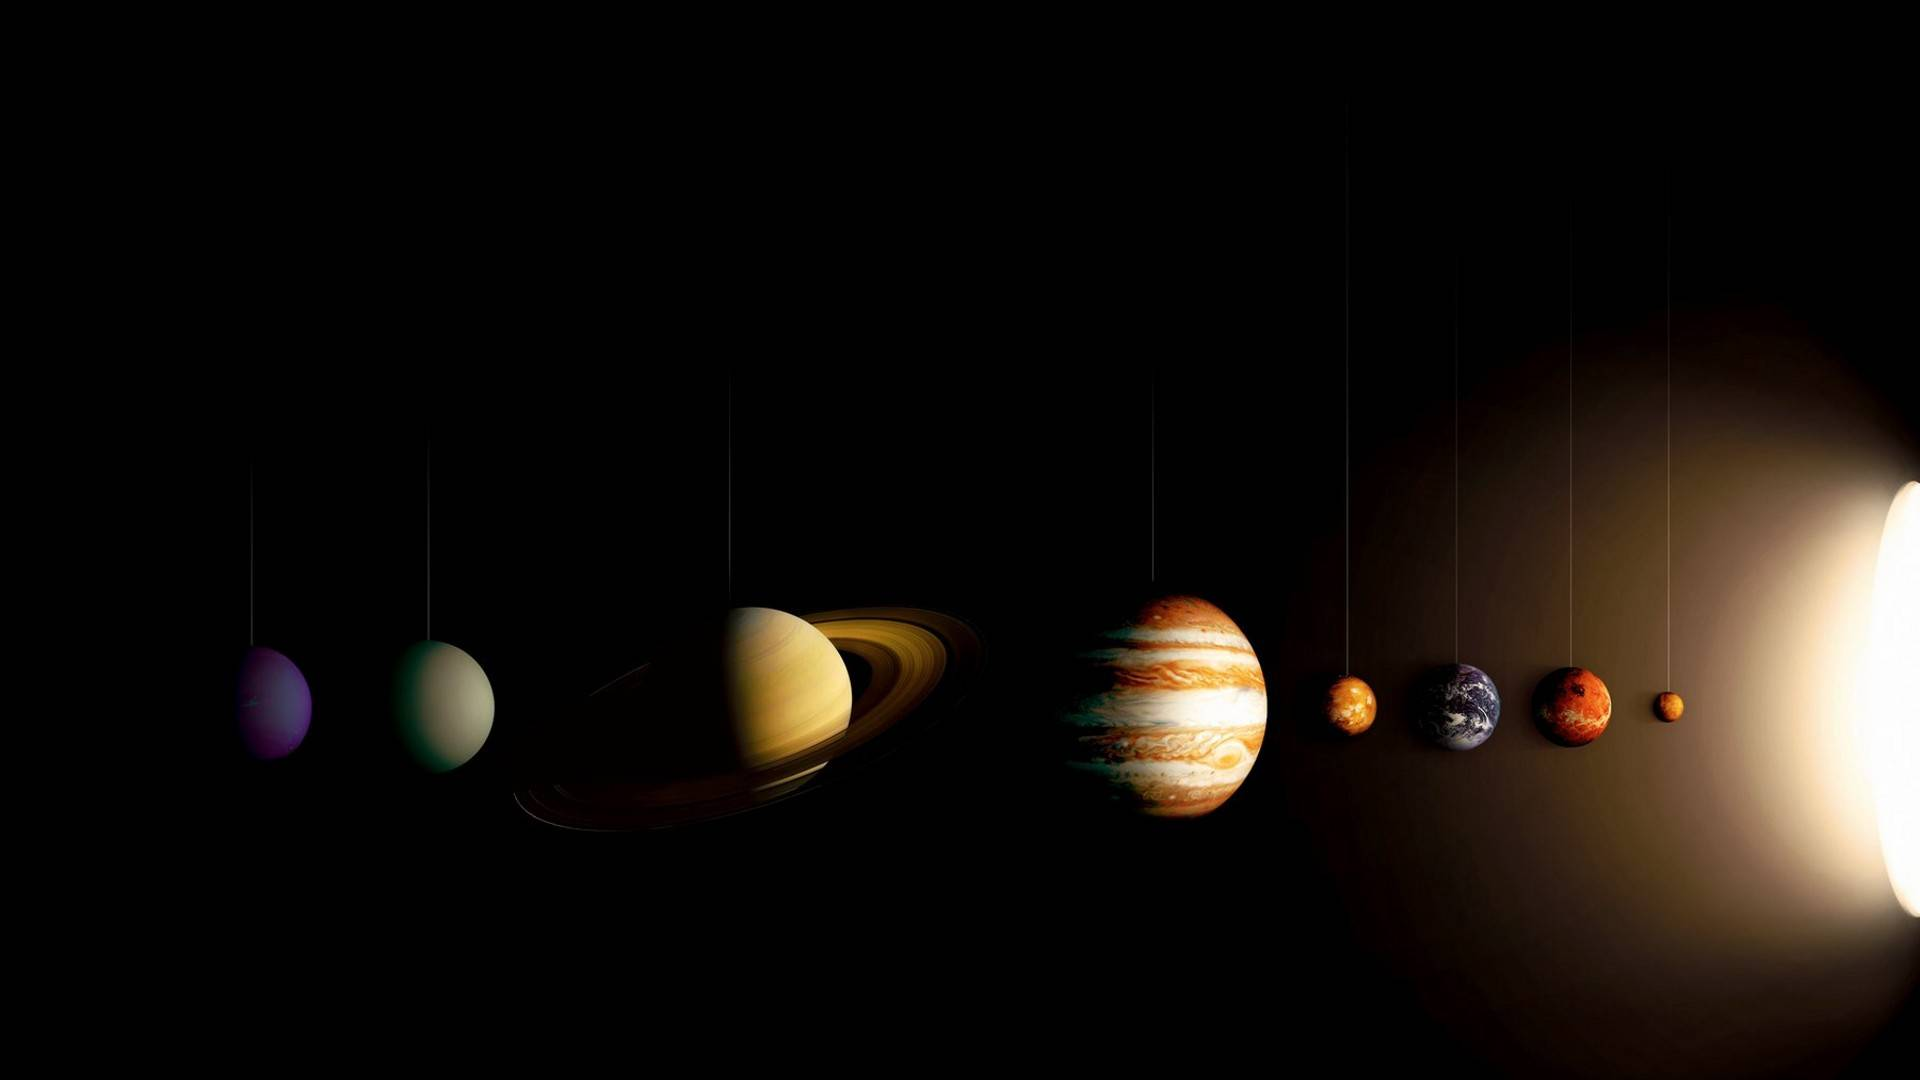 Beautiful Space 3d Live Wallpaper And Screensaver Hd Solar System Backgrounds Pixelstalk Net